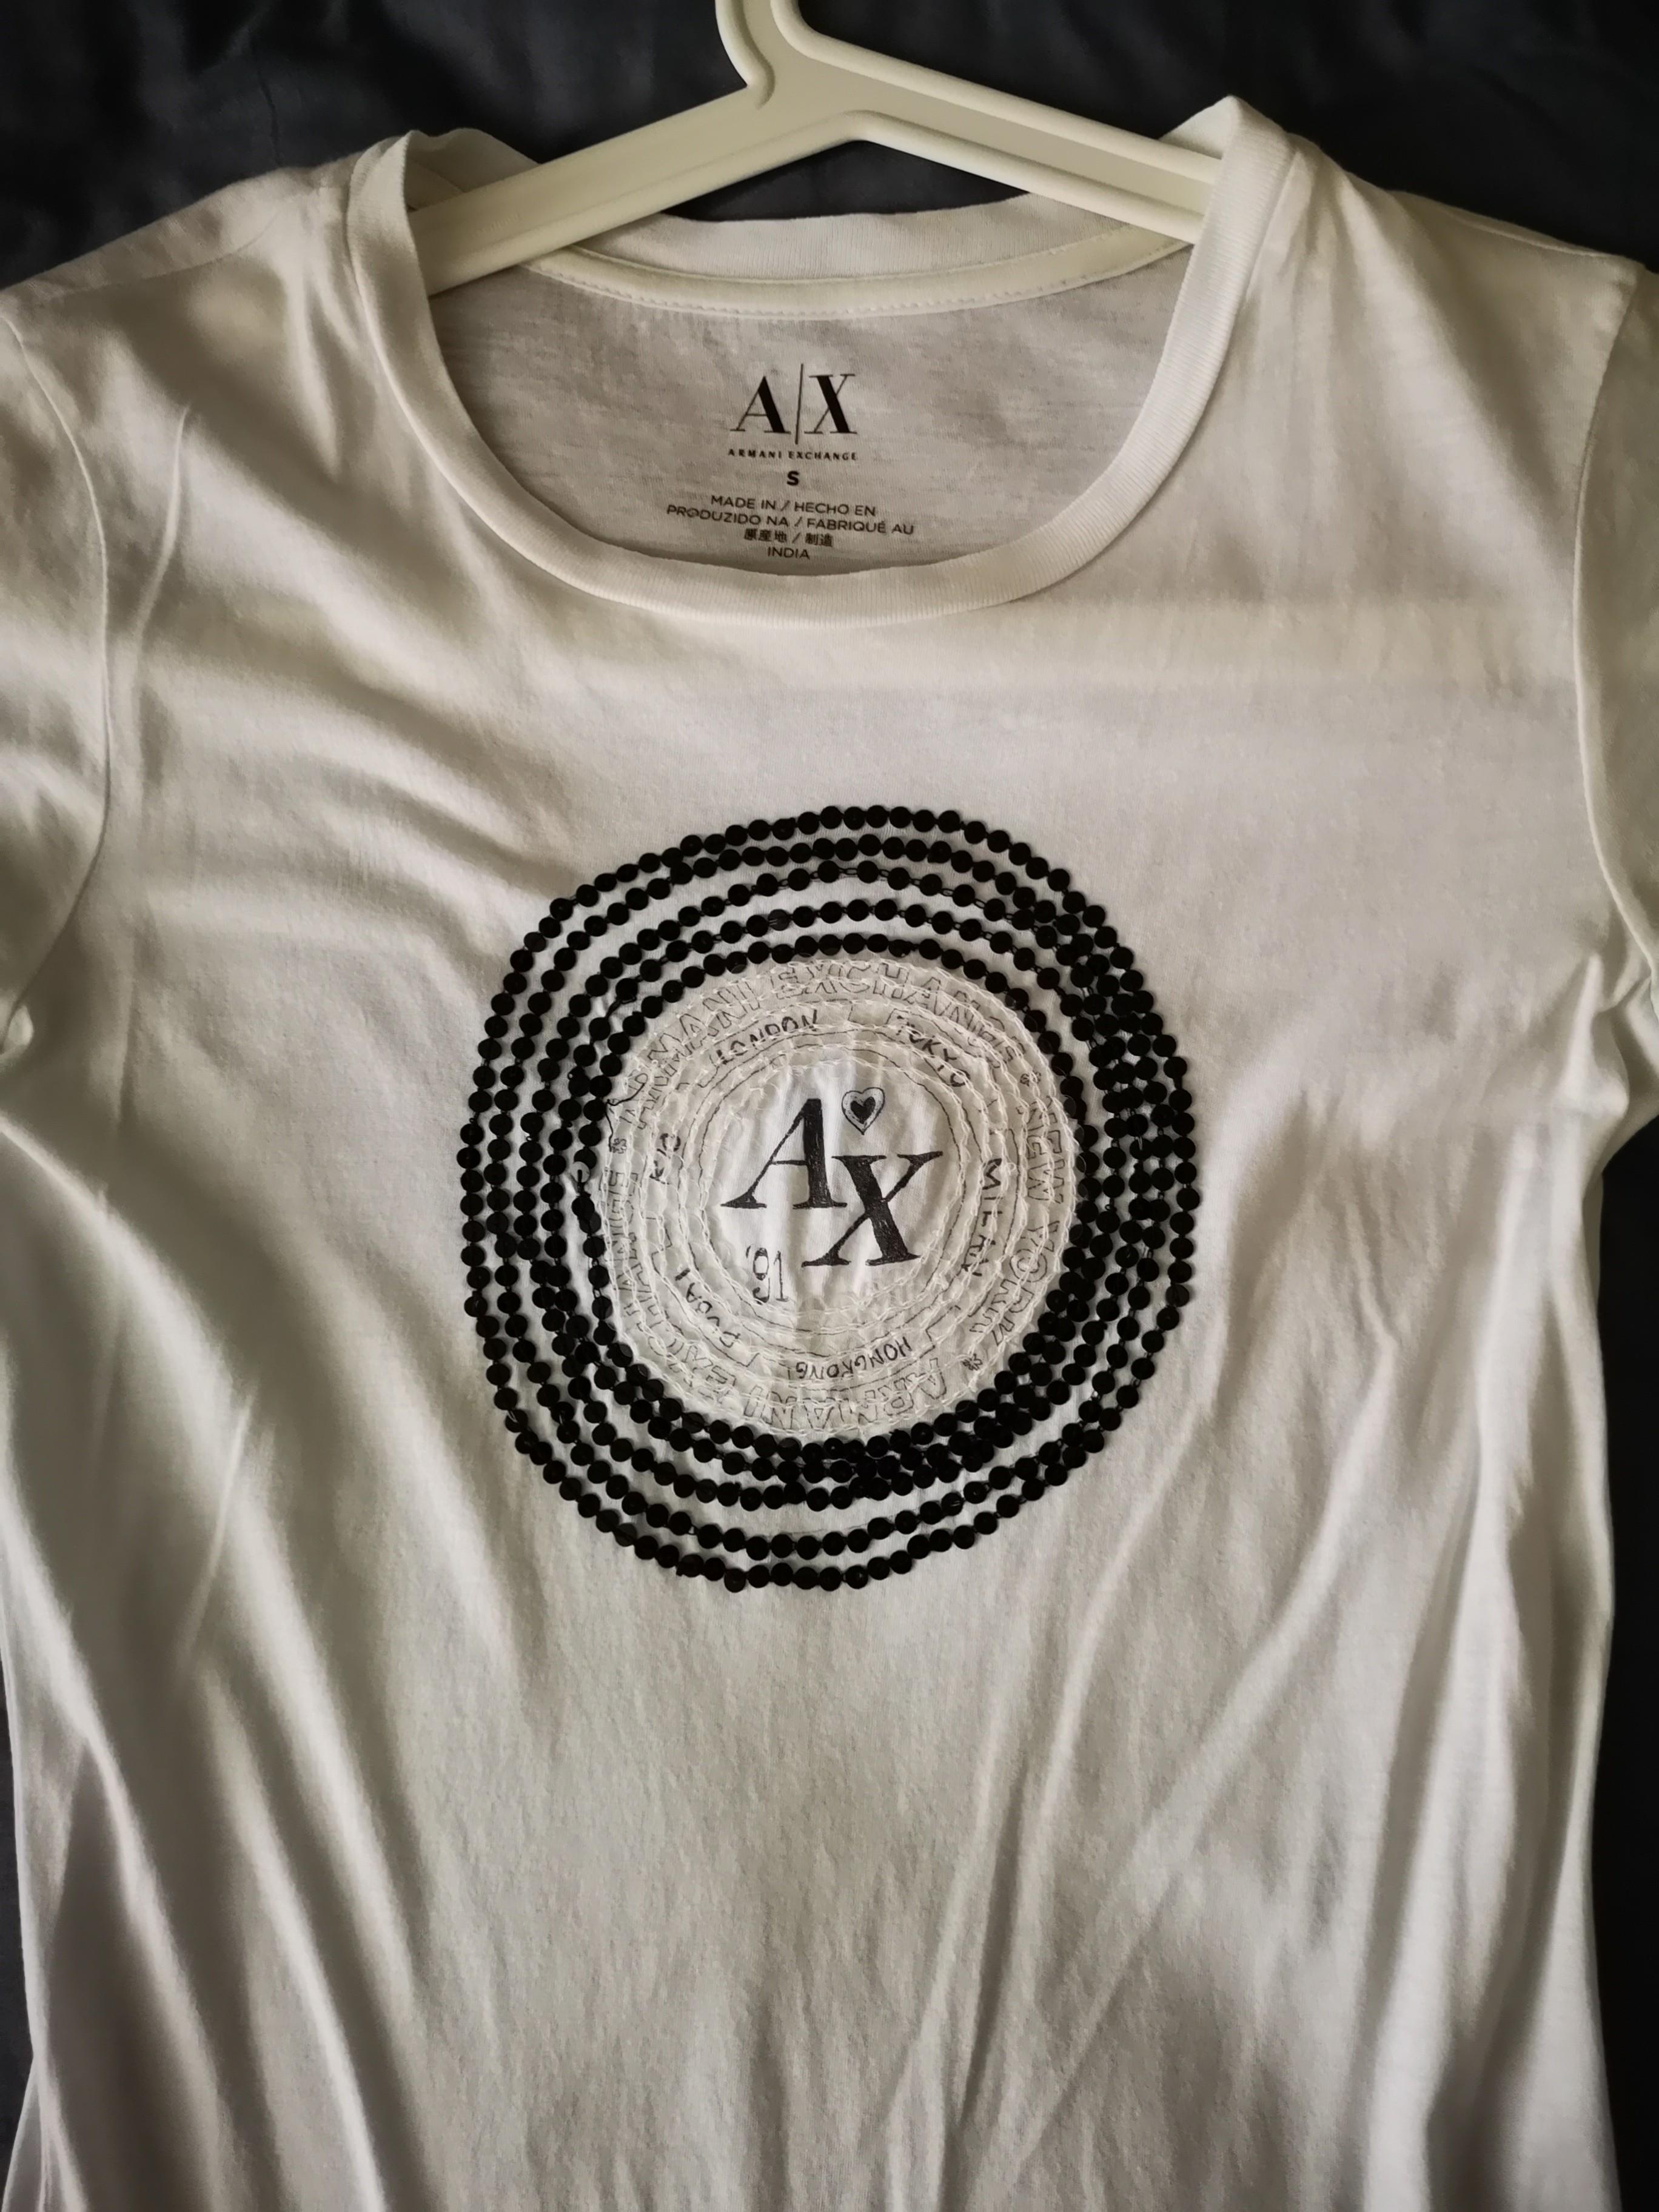 cce0417dfba Armani T Shirts India - DREAMWORKS